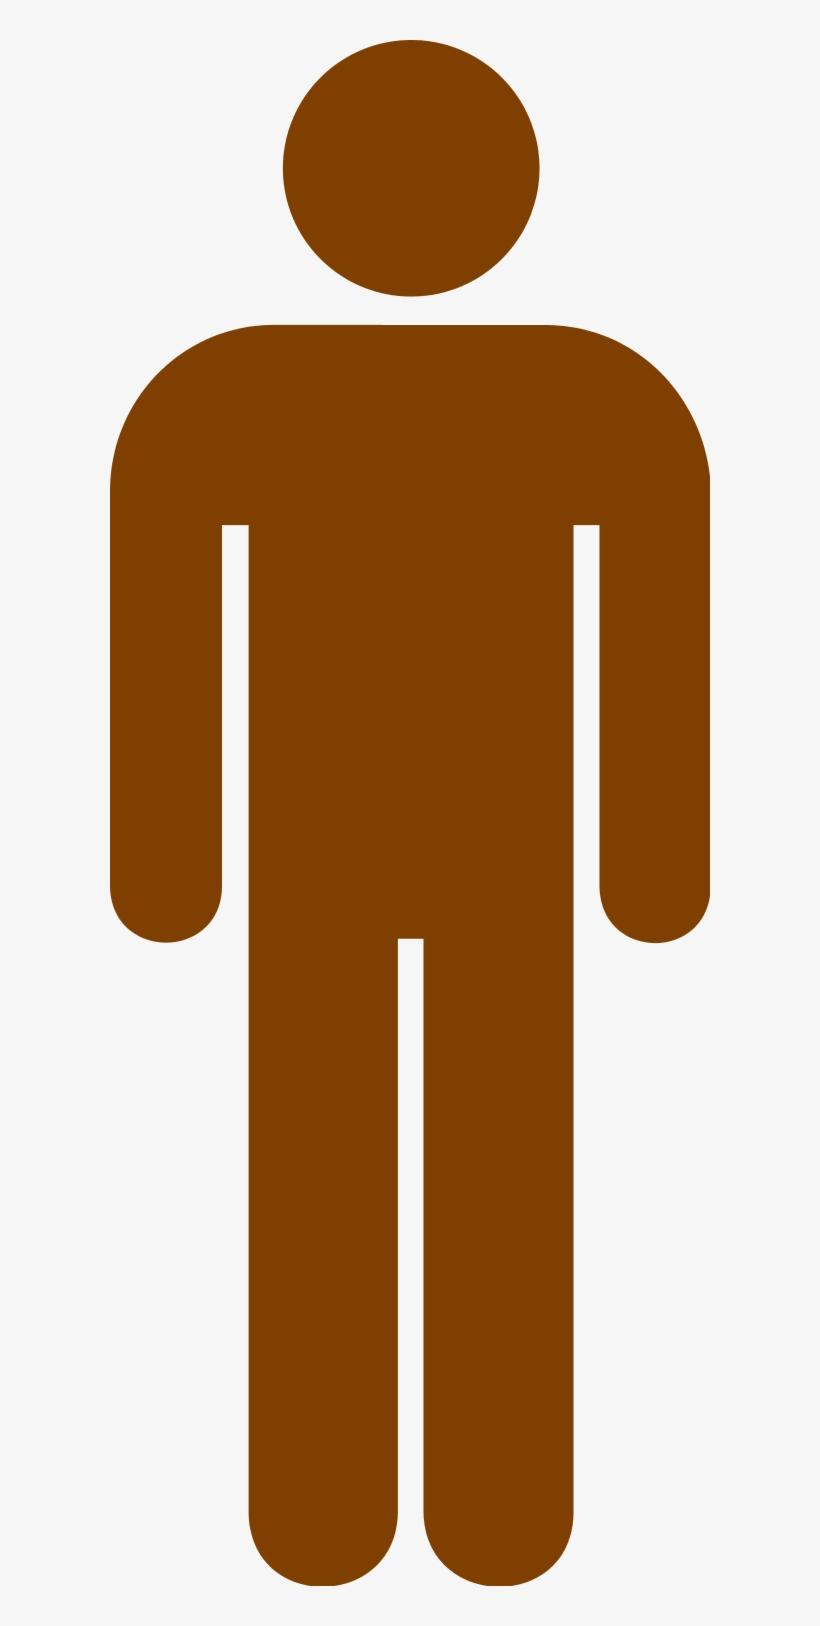 men s bathroom sign vector man bathroom sign clipart - male blue bathroom  sign transparent png - 600x1546 - free download on nicepng  nicepng